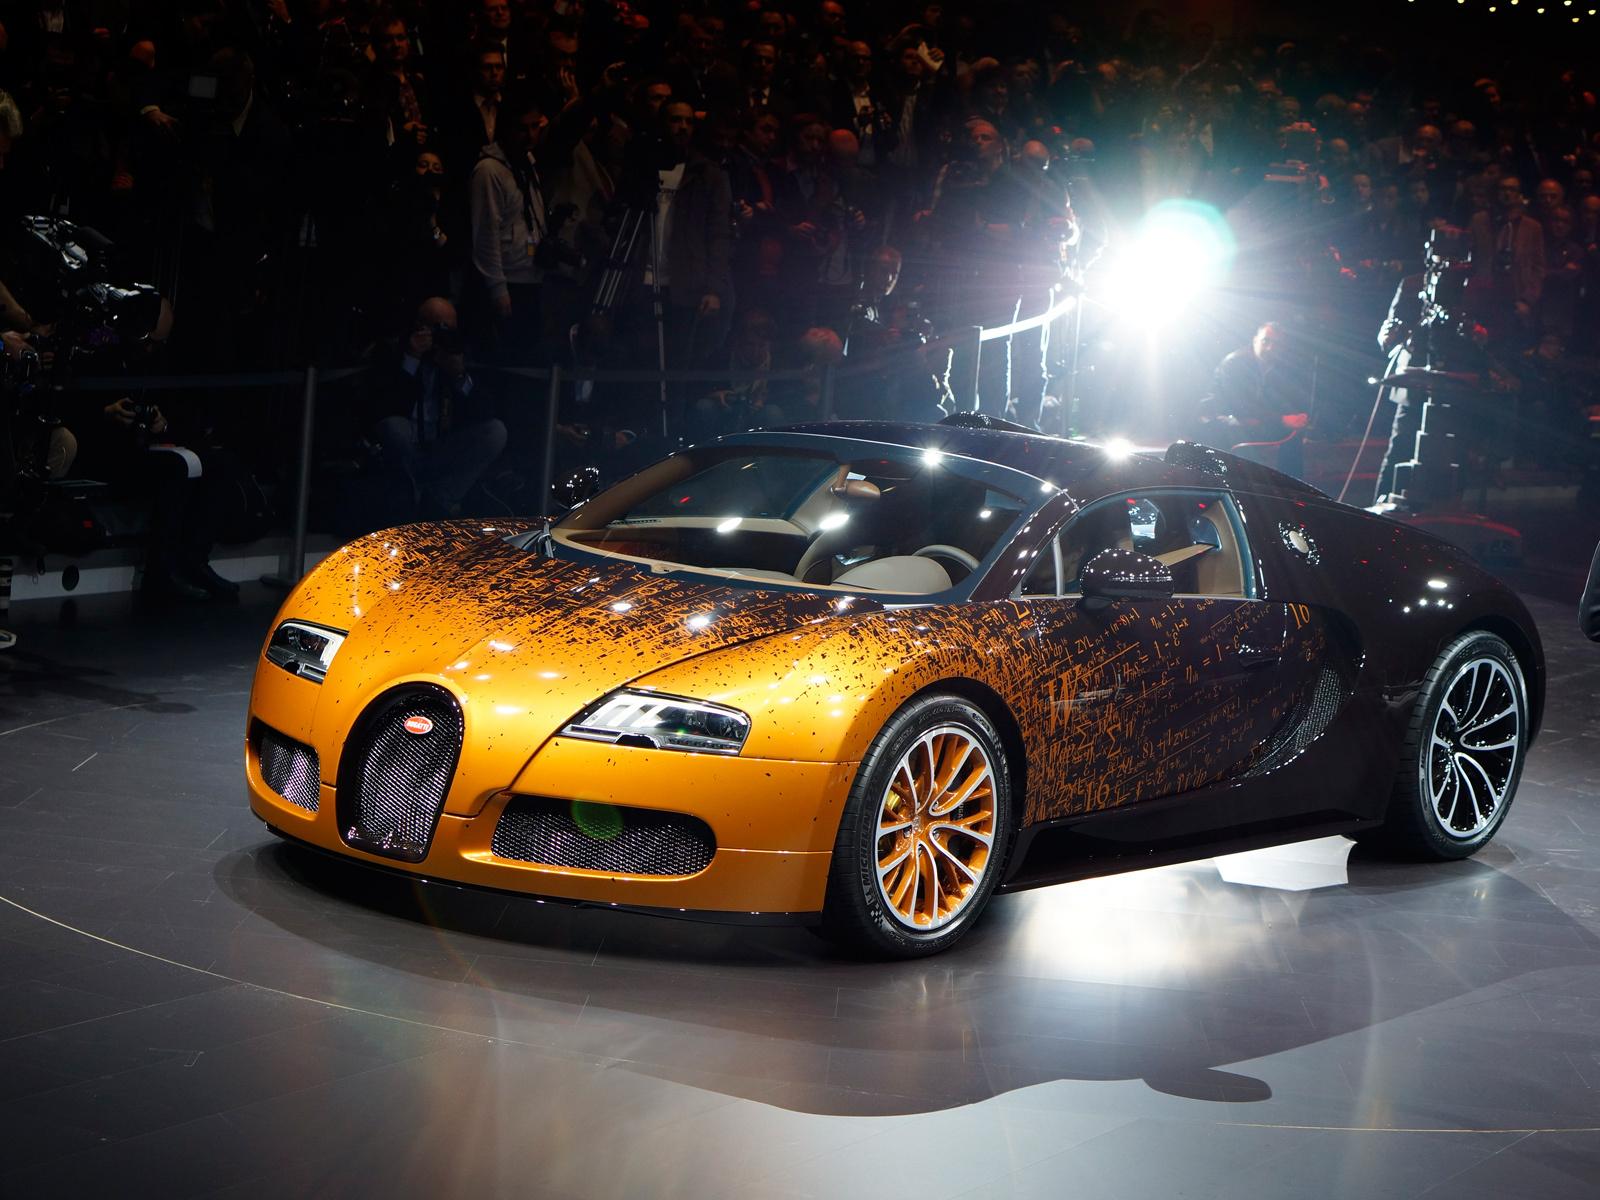 refCars: Bugatti Veyron Grand Sport Venet special edition